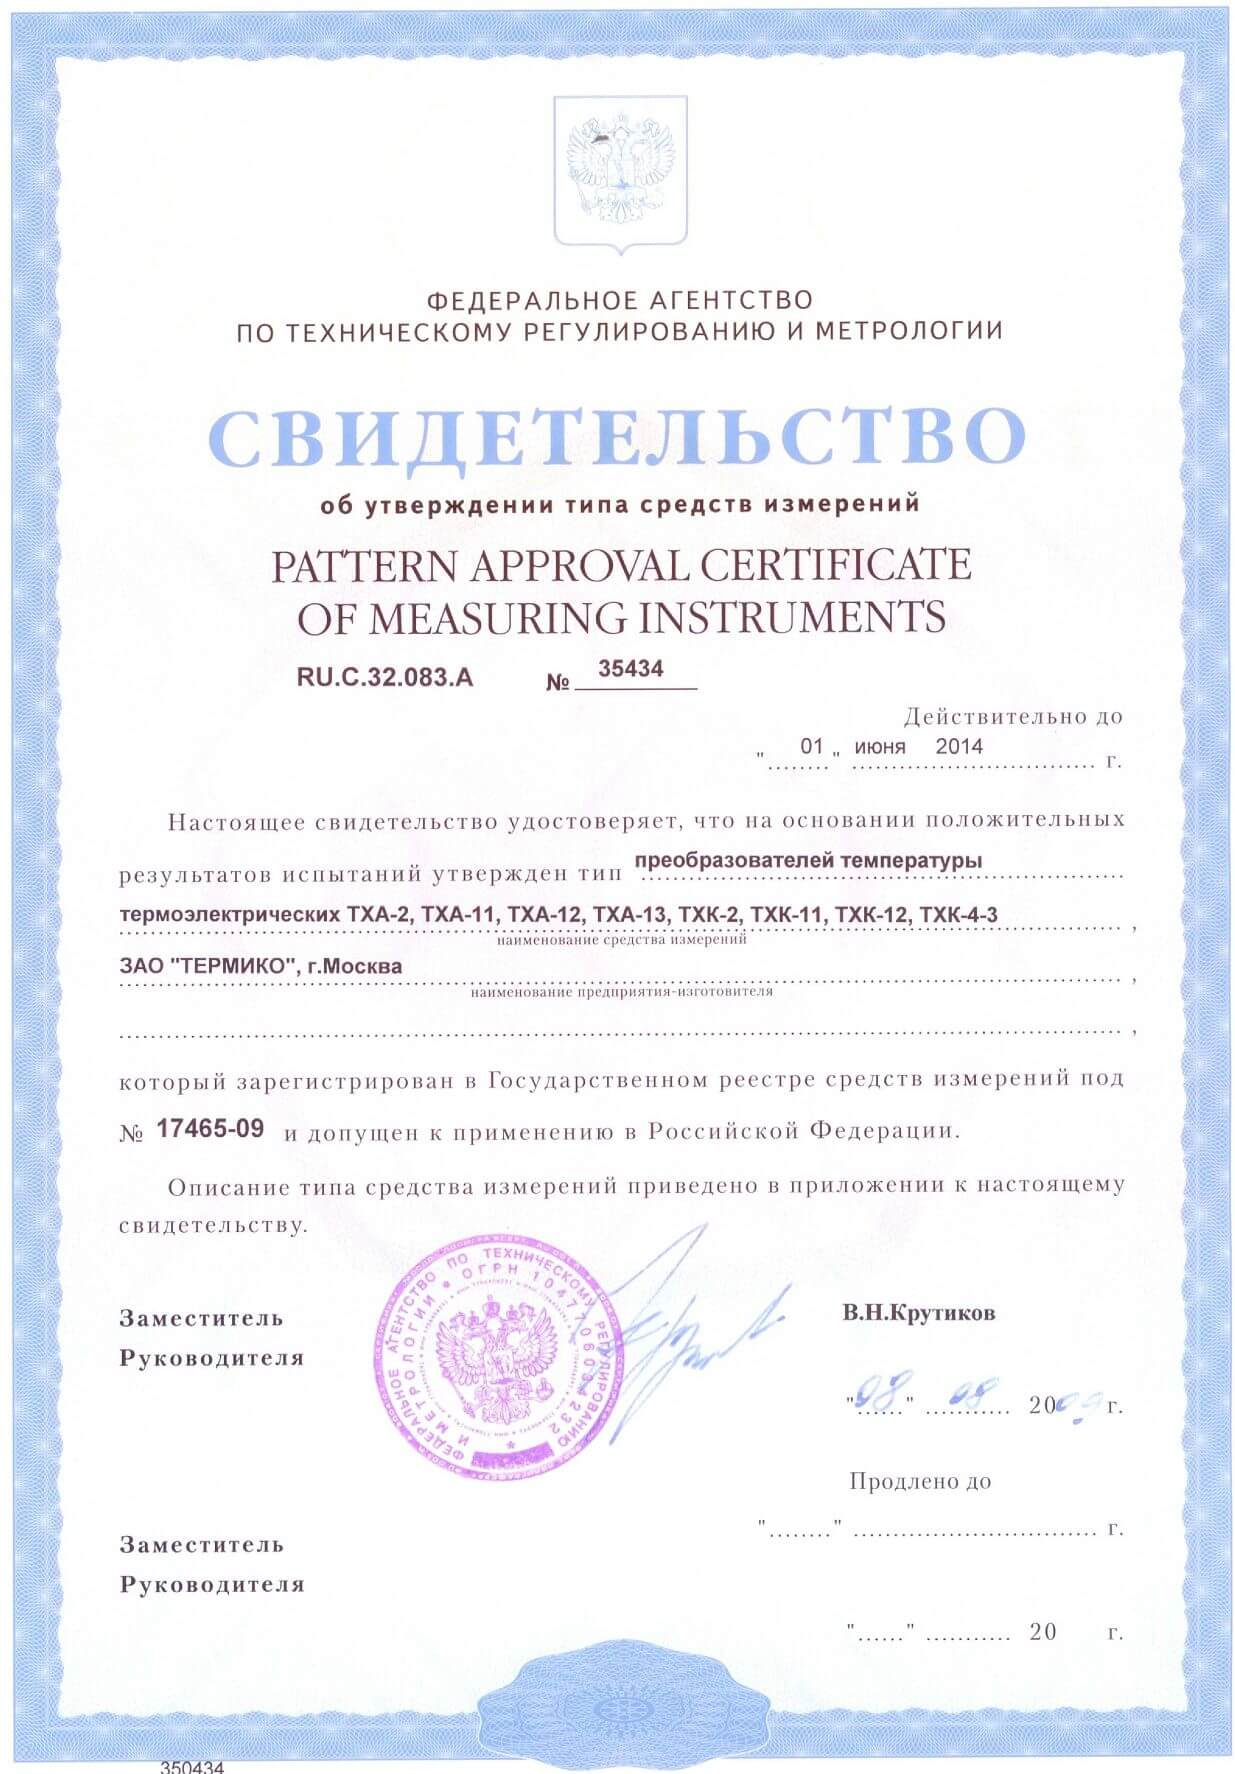 Сертификат №17465-09